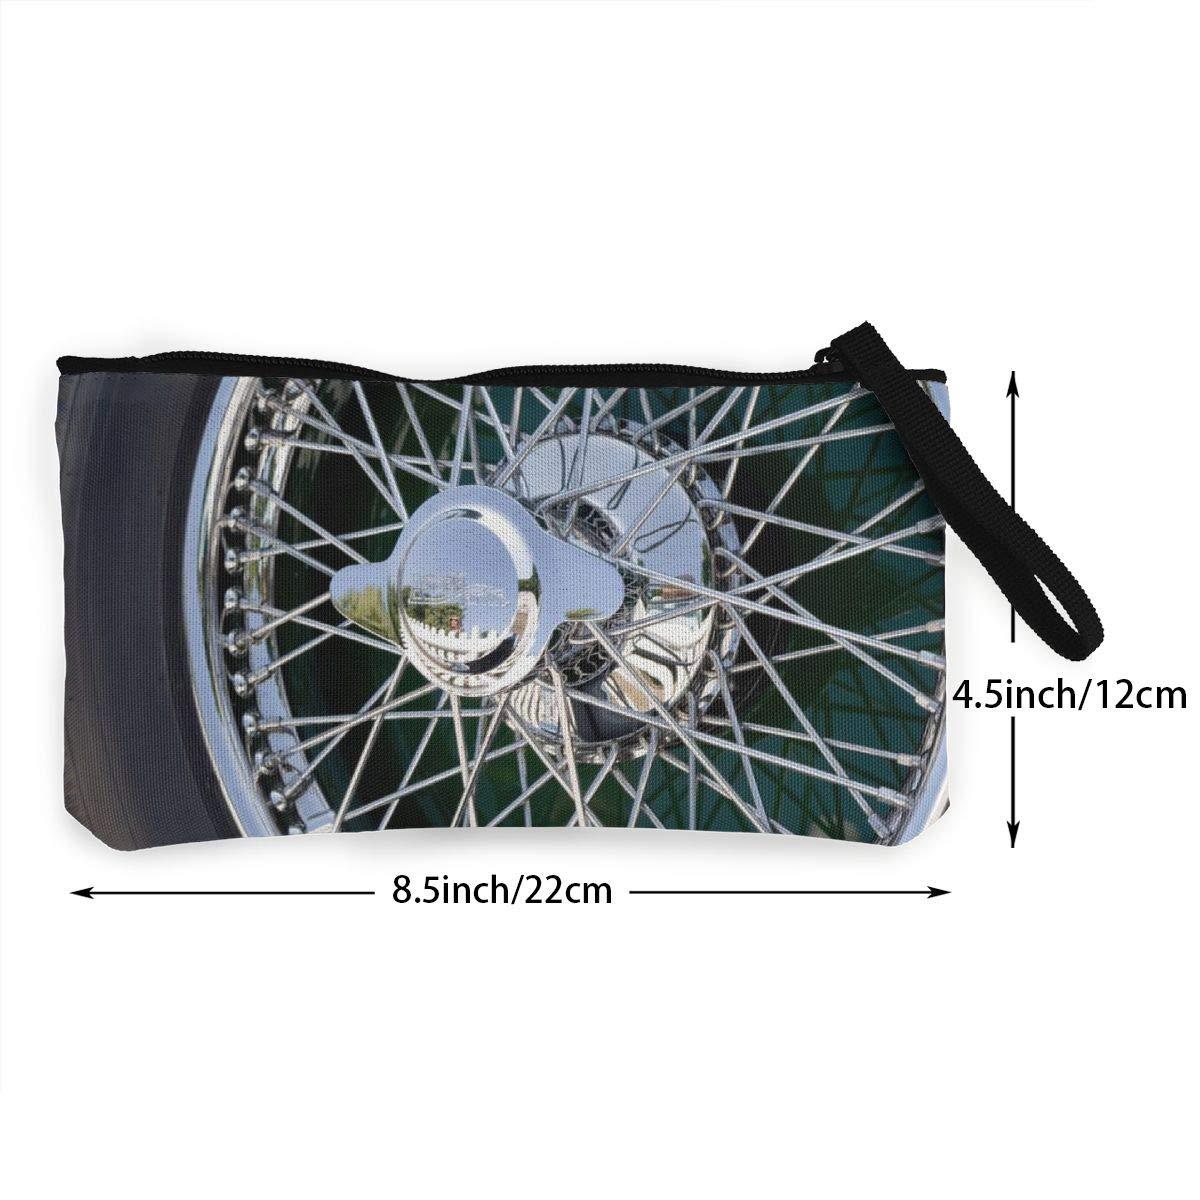 Car Wheel Zipper Canvas Coin Purse Wallet Make Up Bag,Cellphone Bag With Handle